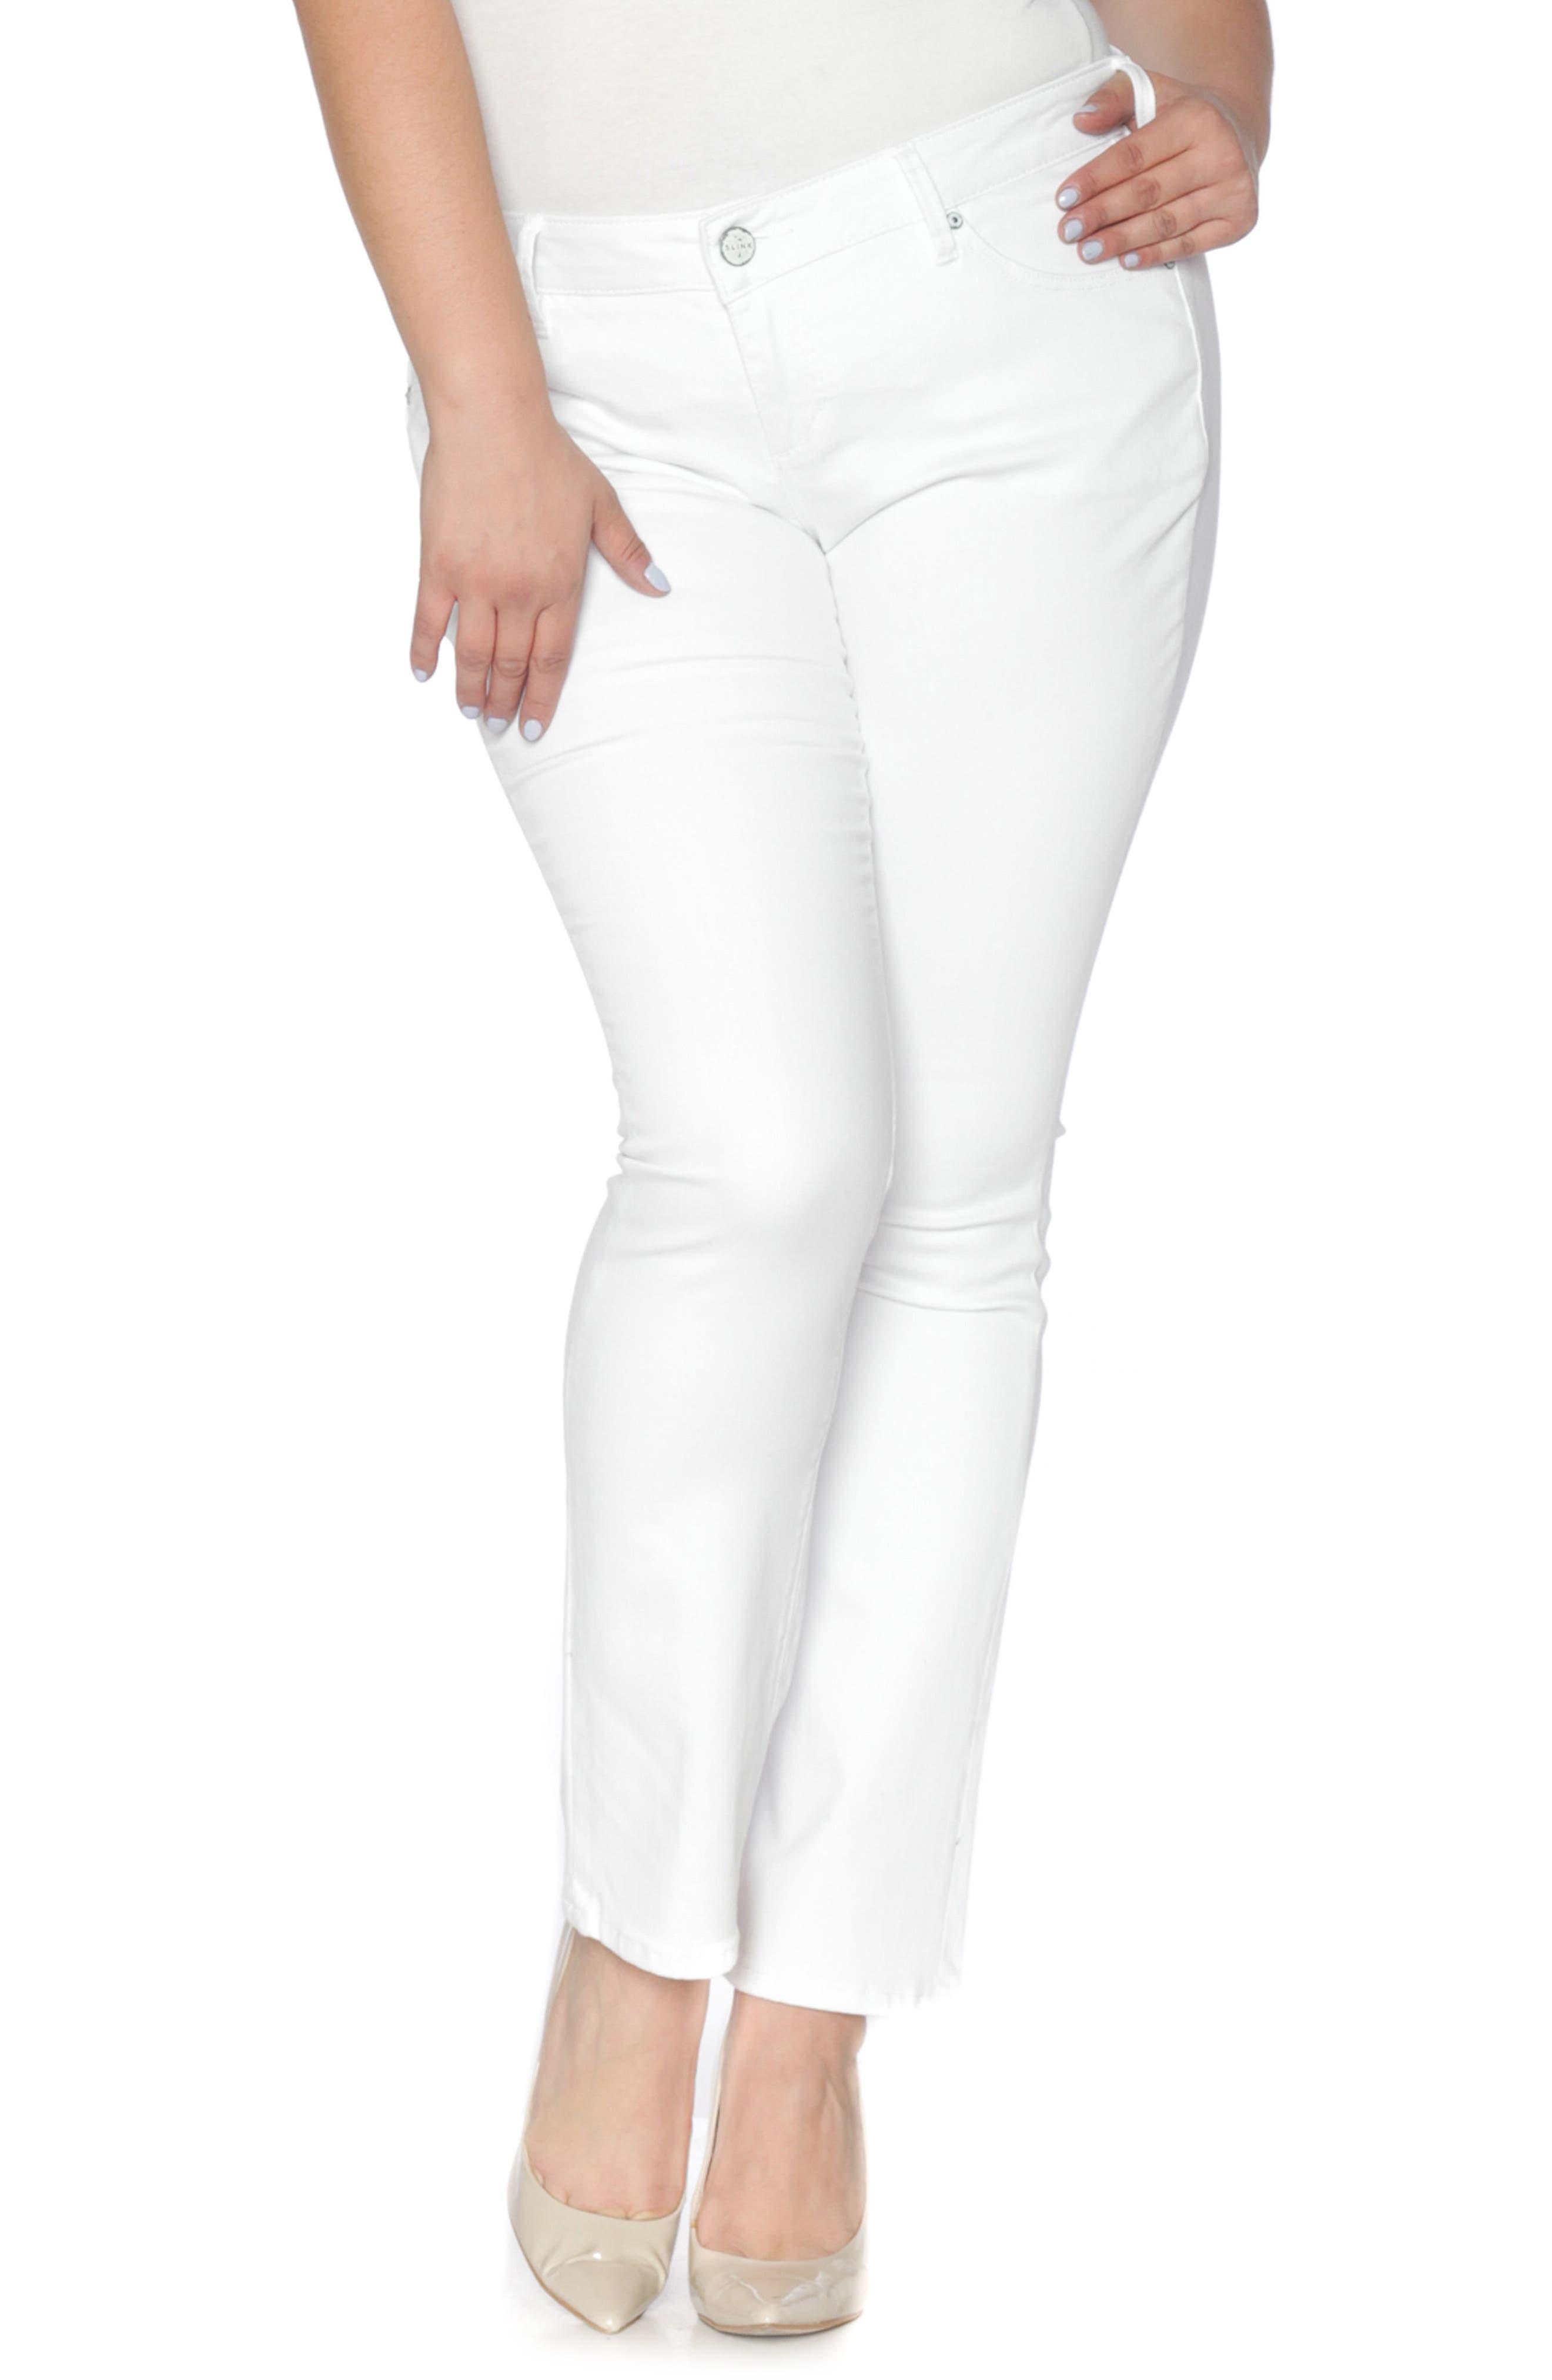 SLINK Jeans Stretch Straight Leg Jeans (Plus Size)